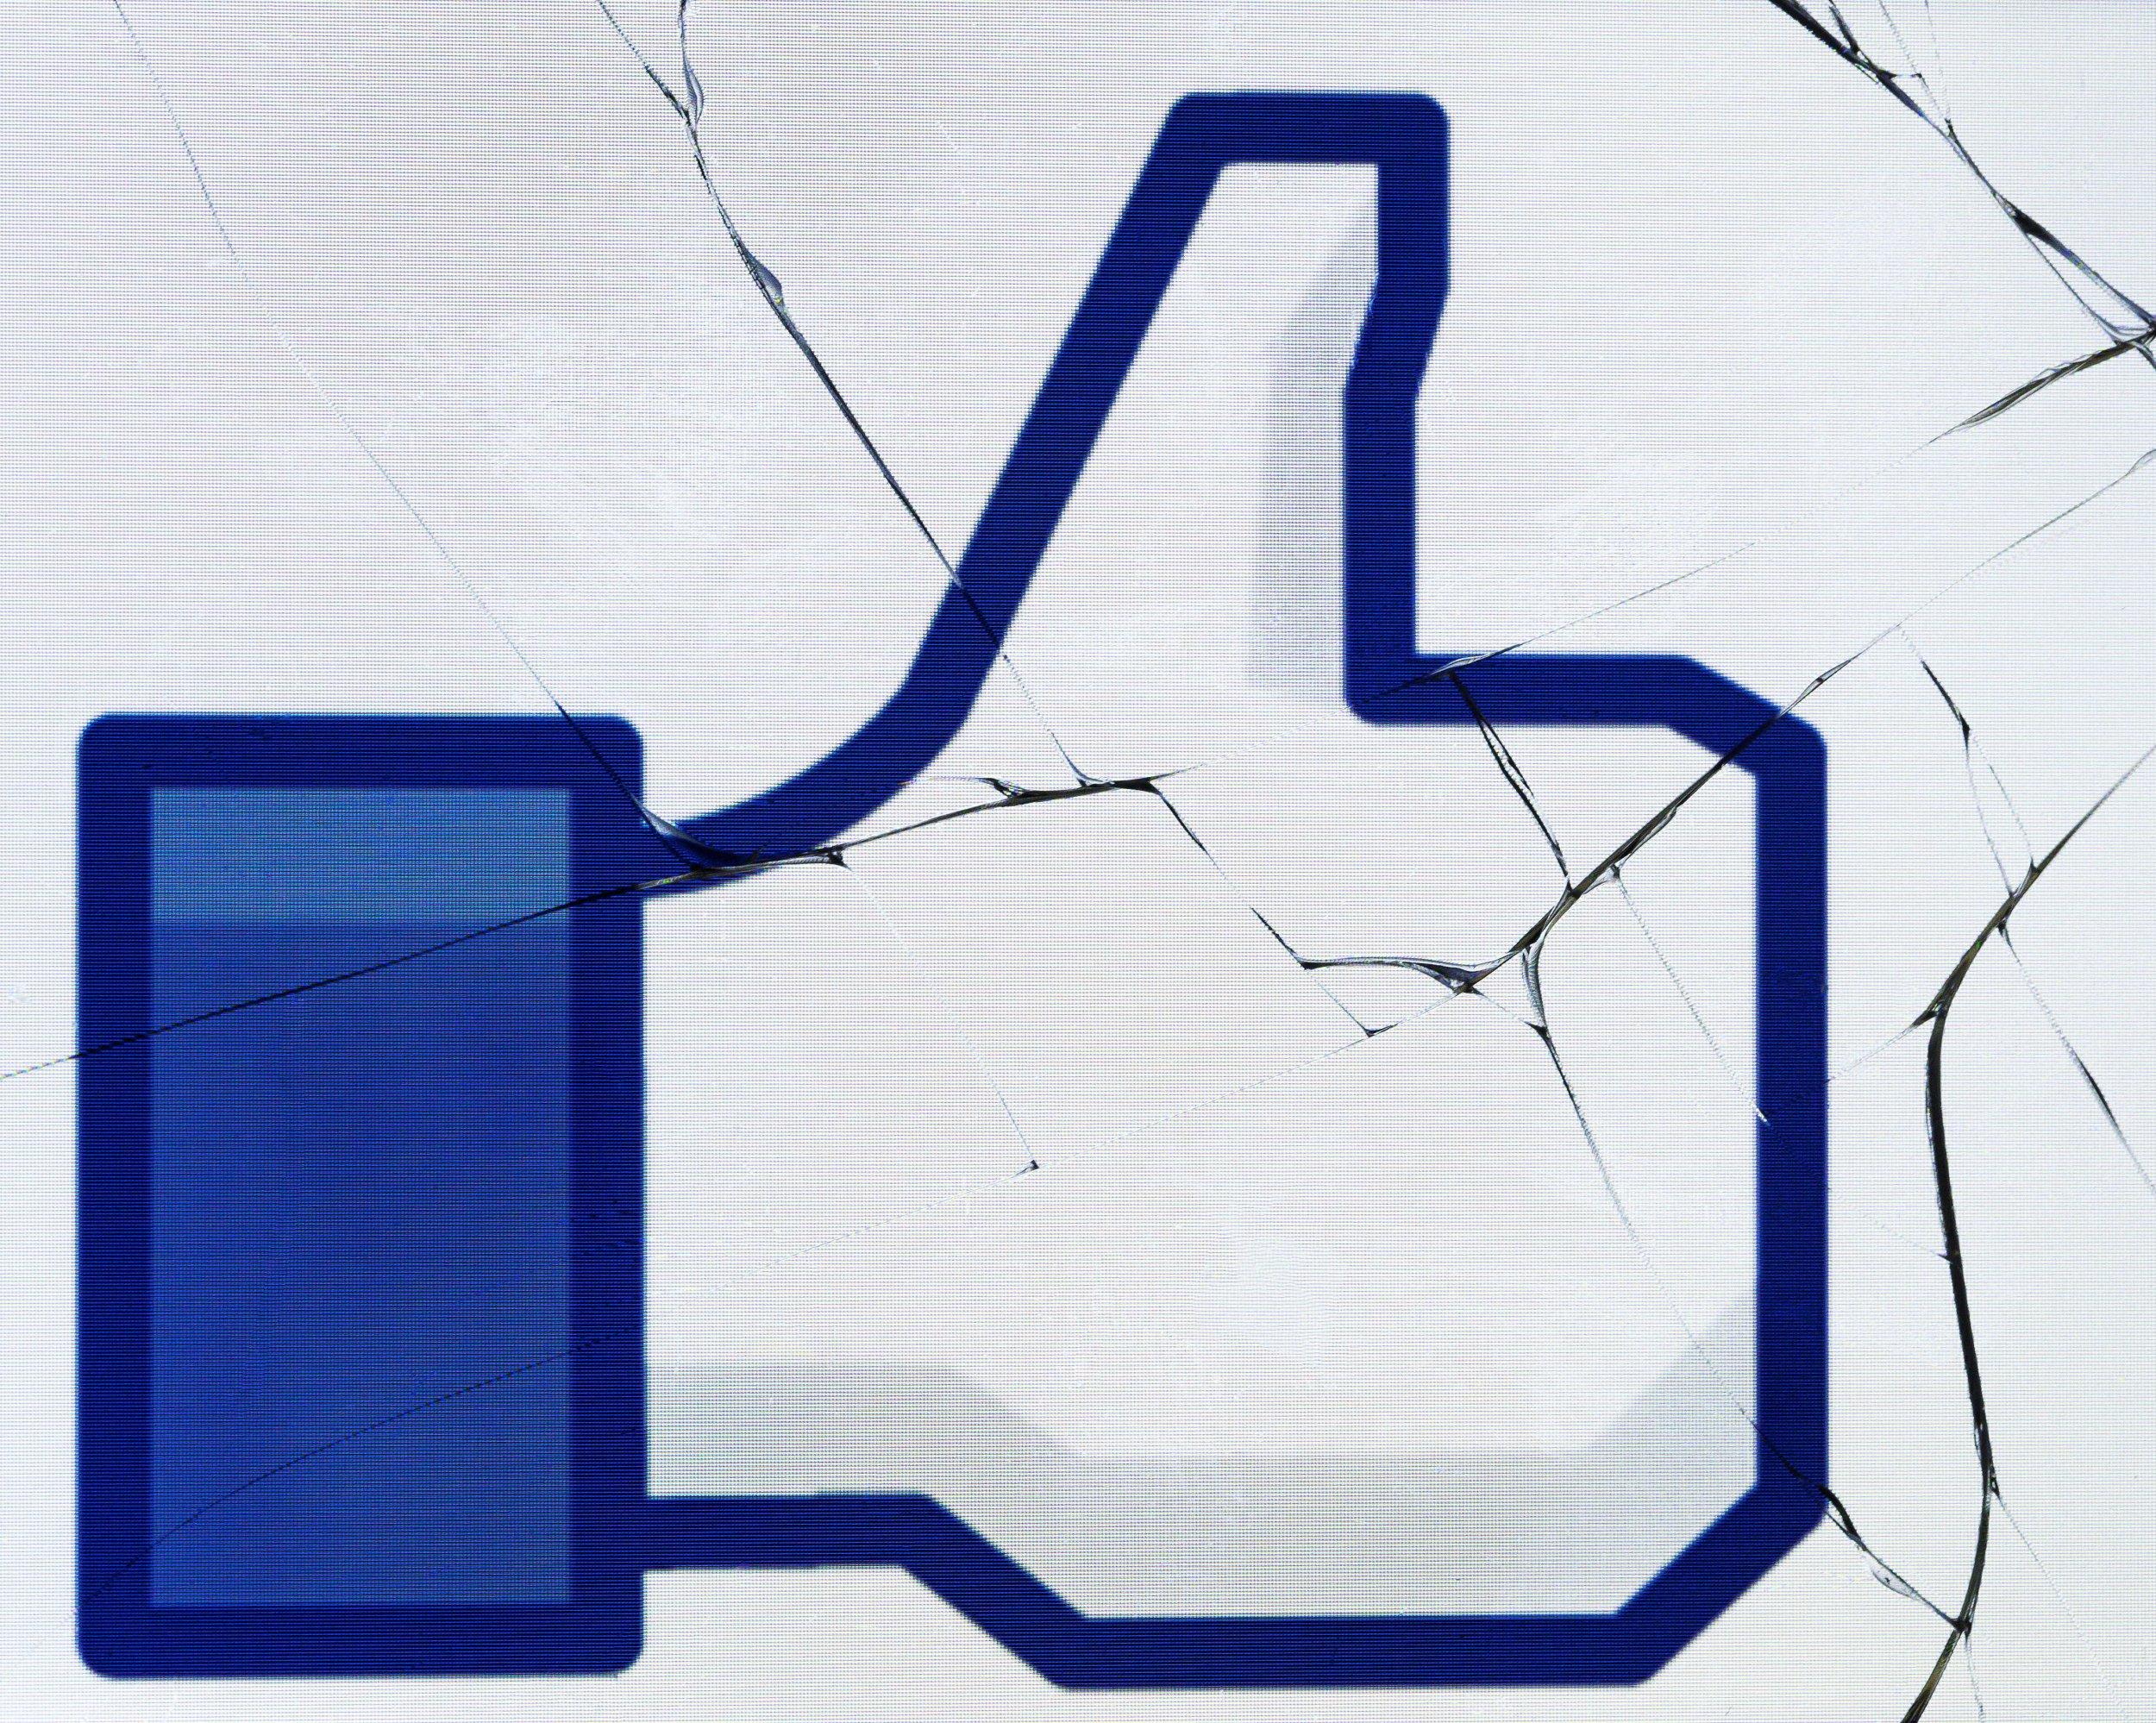 facebook logo shatter, site down